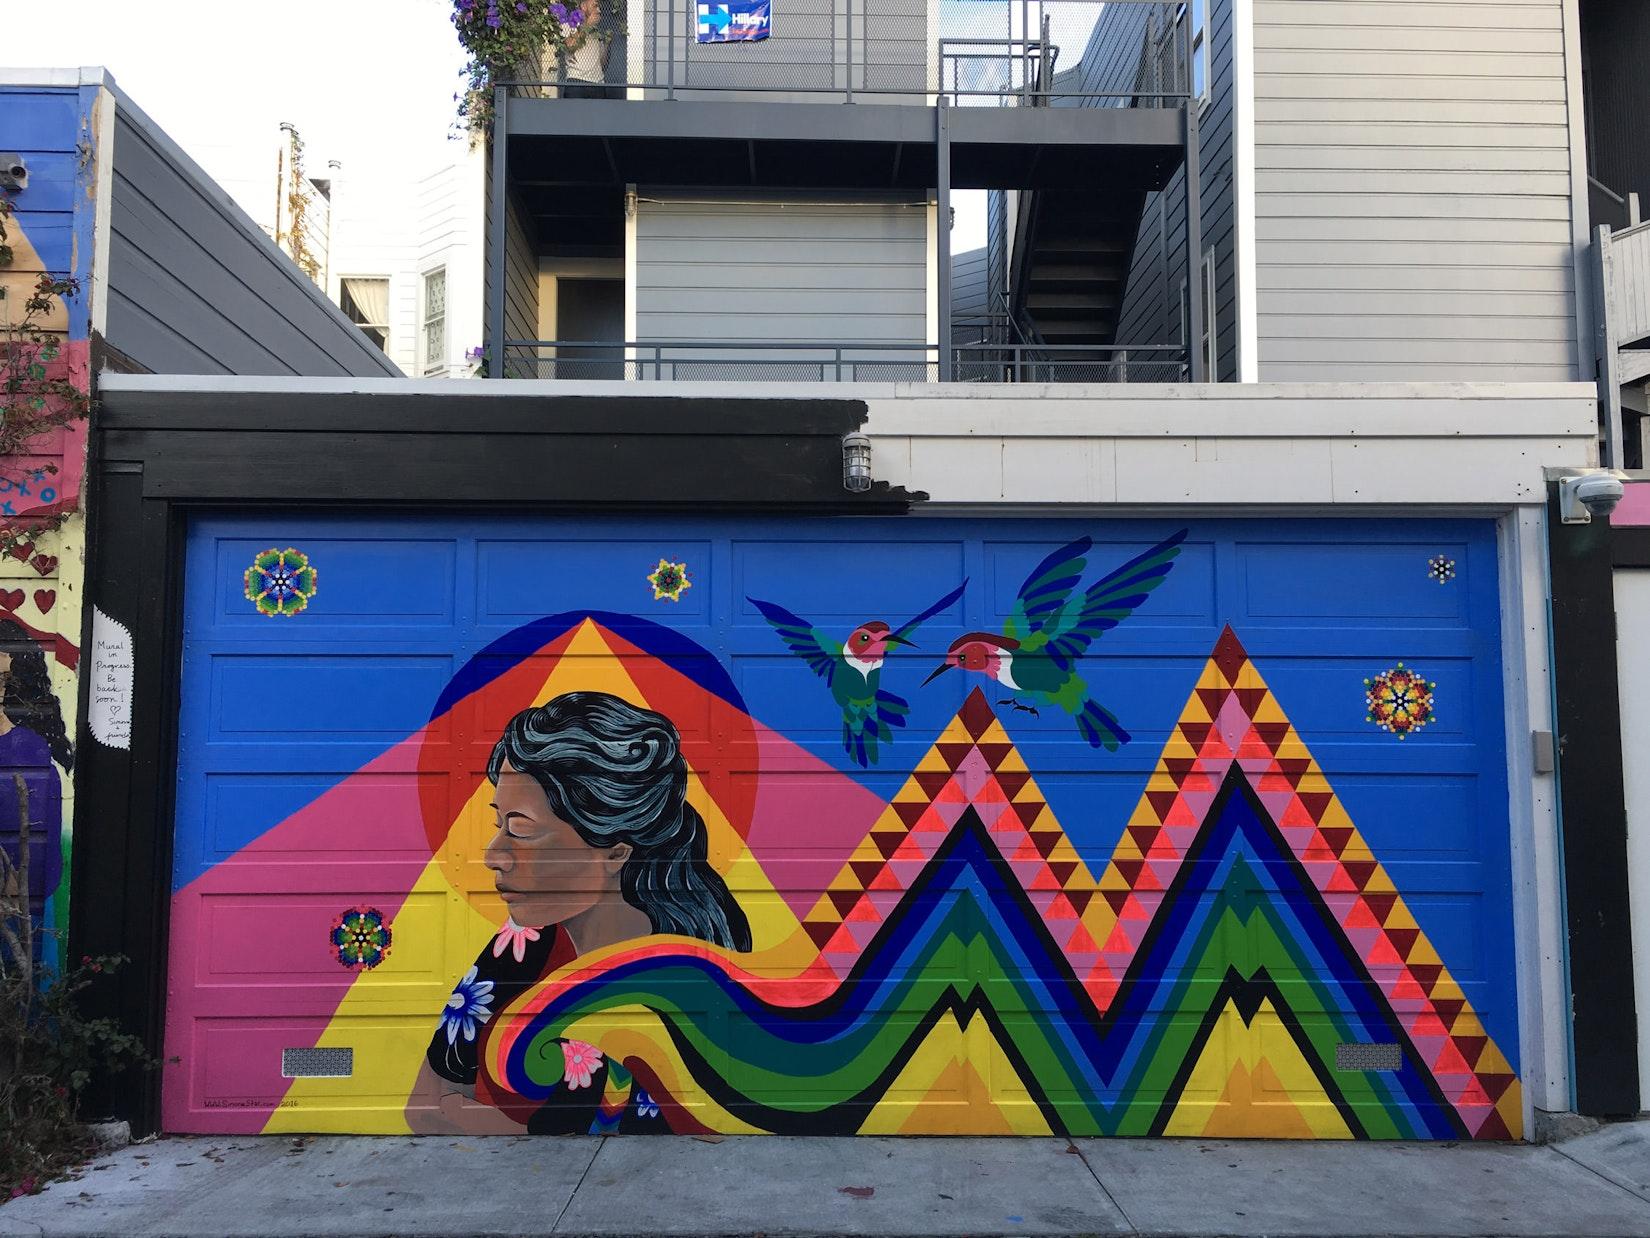 Mural in Balmy Alley in San Francisco